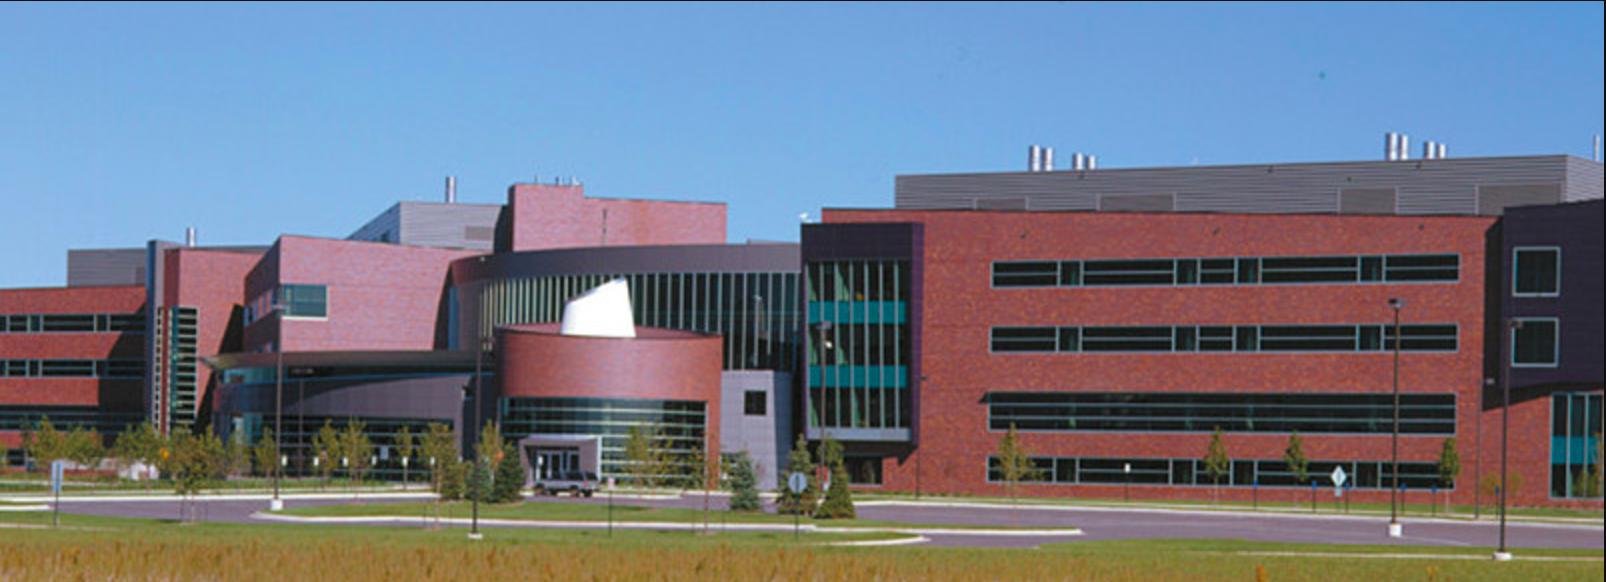 MD Biosciences US Facilities